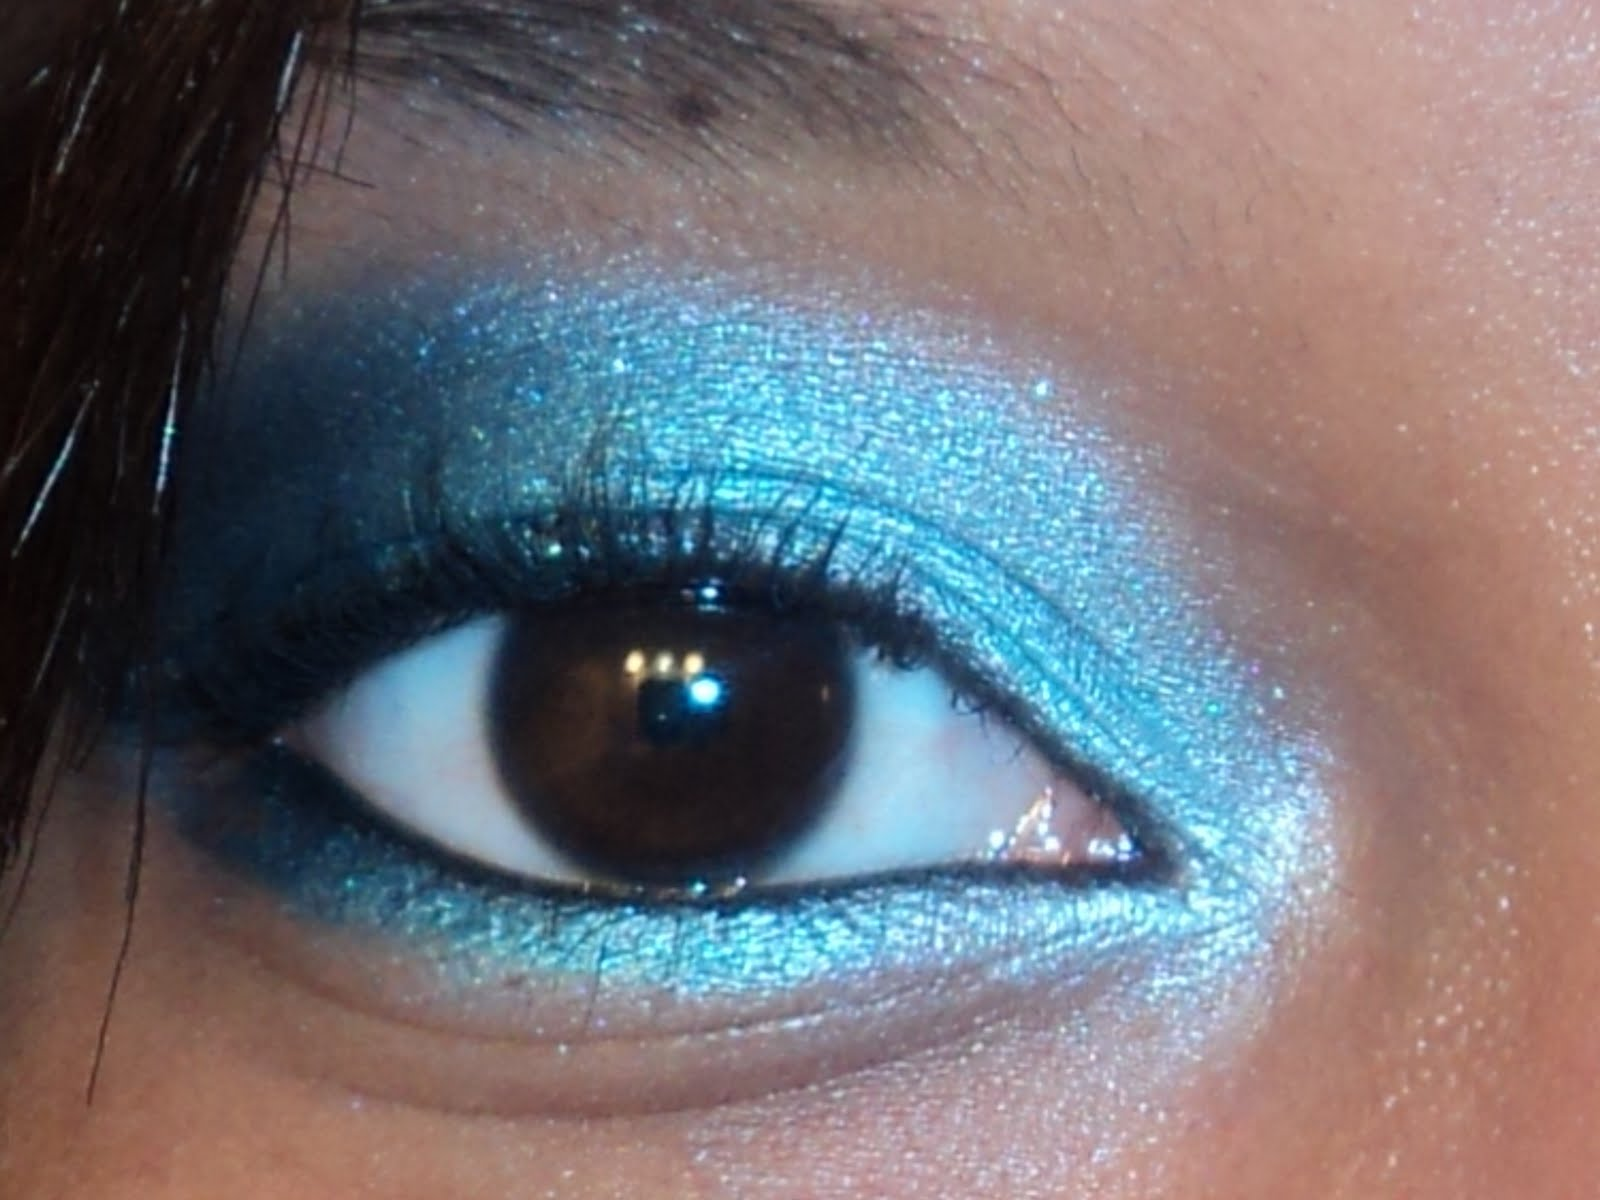 http://1.bp.blogspot.com/_PDLvVz0QiFw/TCUJFnnrWwI/AAAAAAAAAAY/caAgmLni6R4/s1600/Makeup+026.jpg